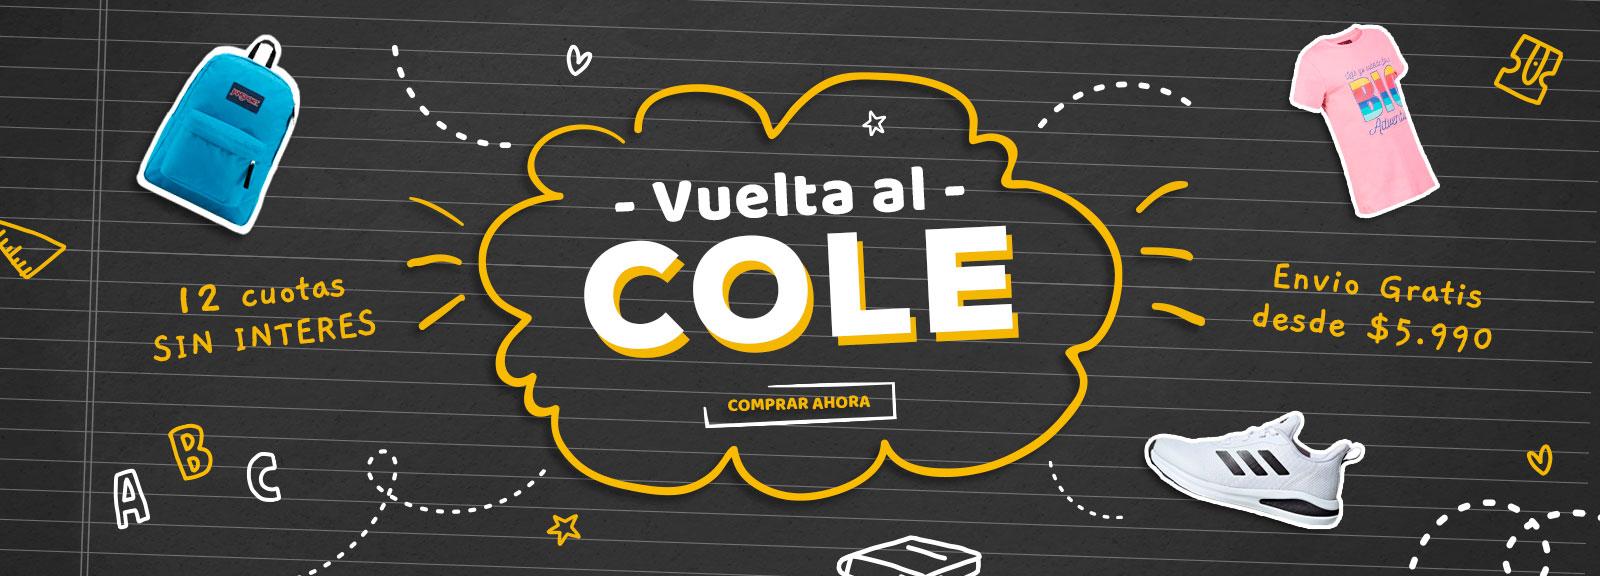 Vuelta Cole 21